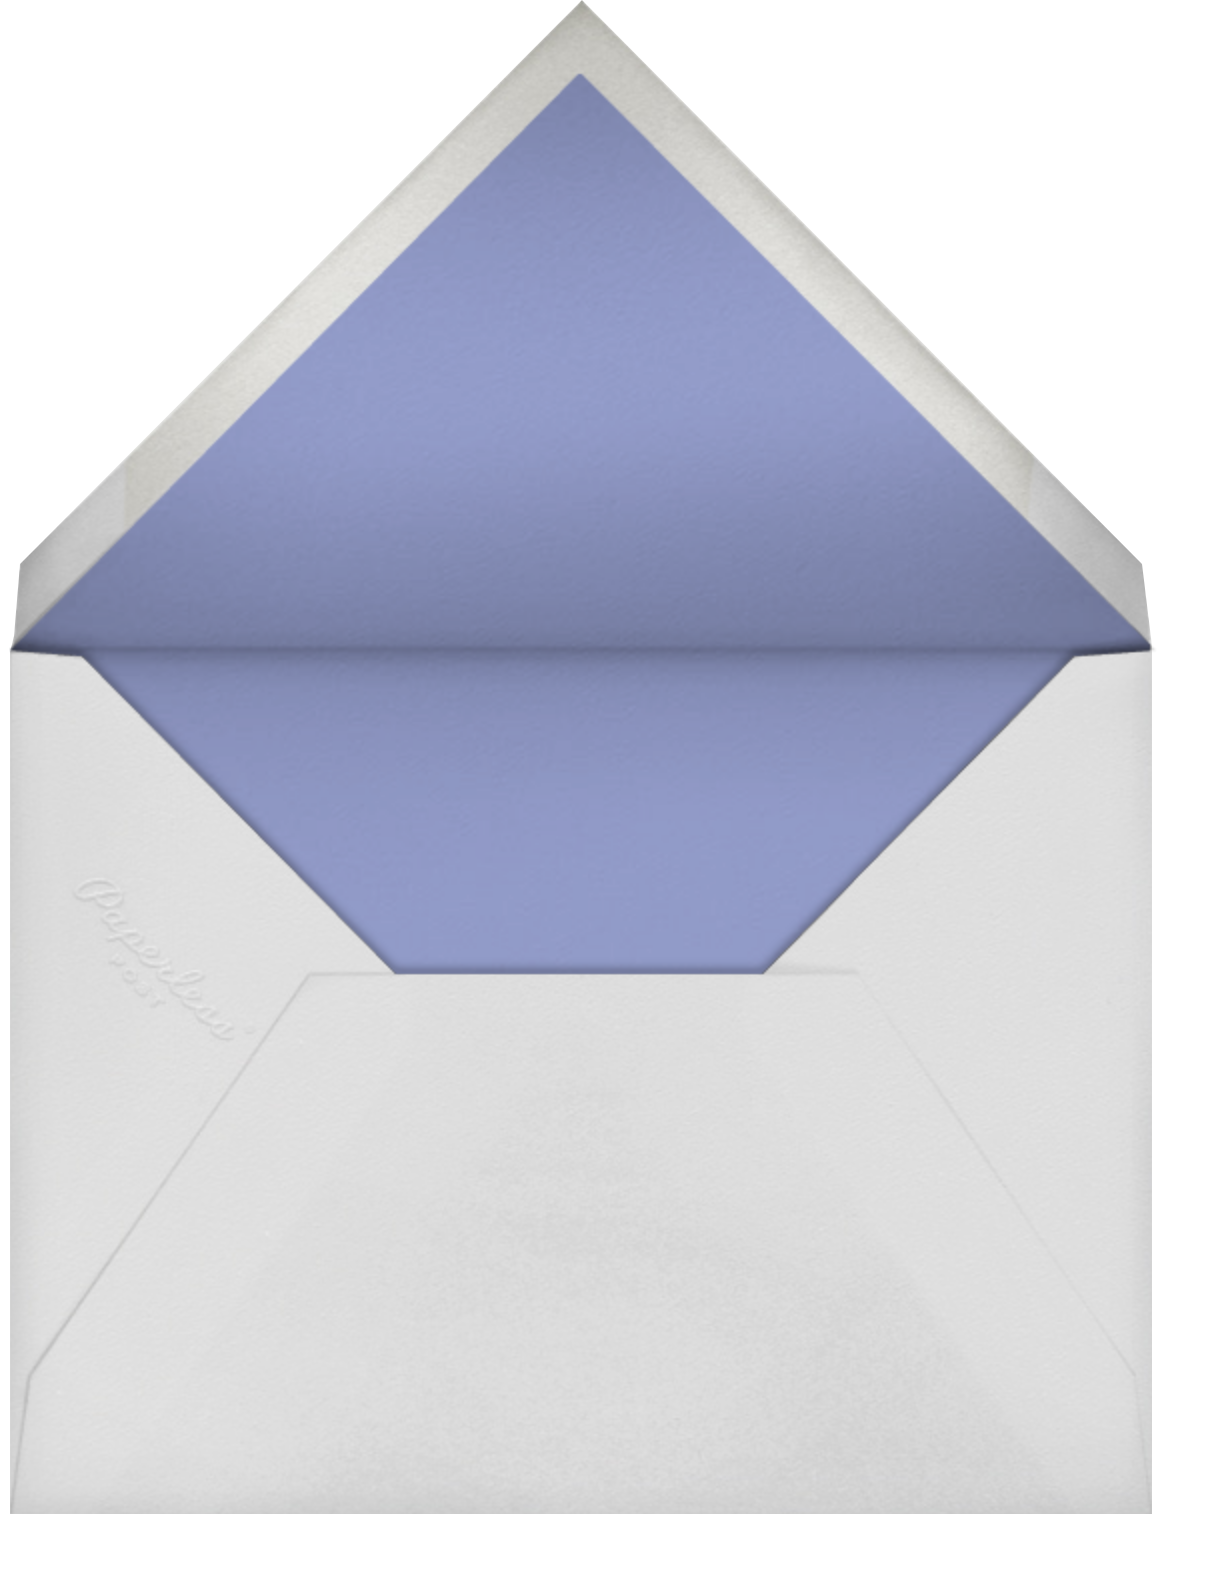 Forsythia - Moss - Paperless Post - Adult birthday - envelope back